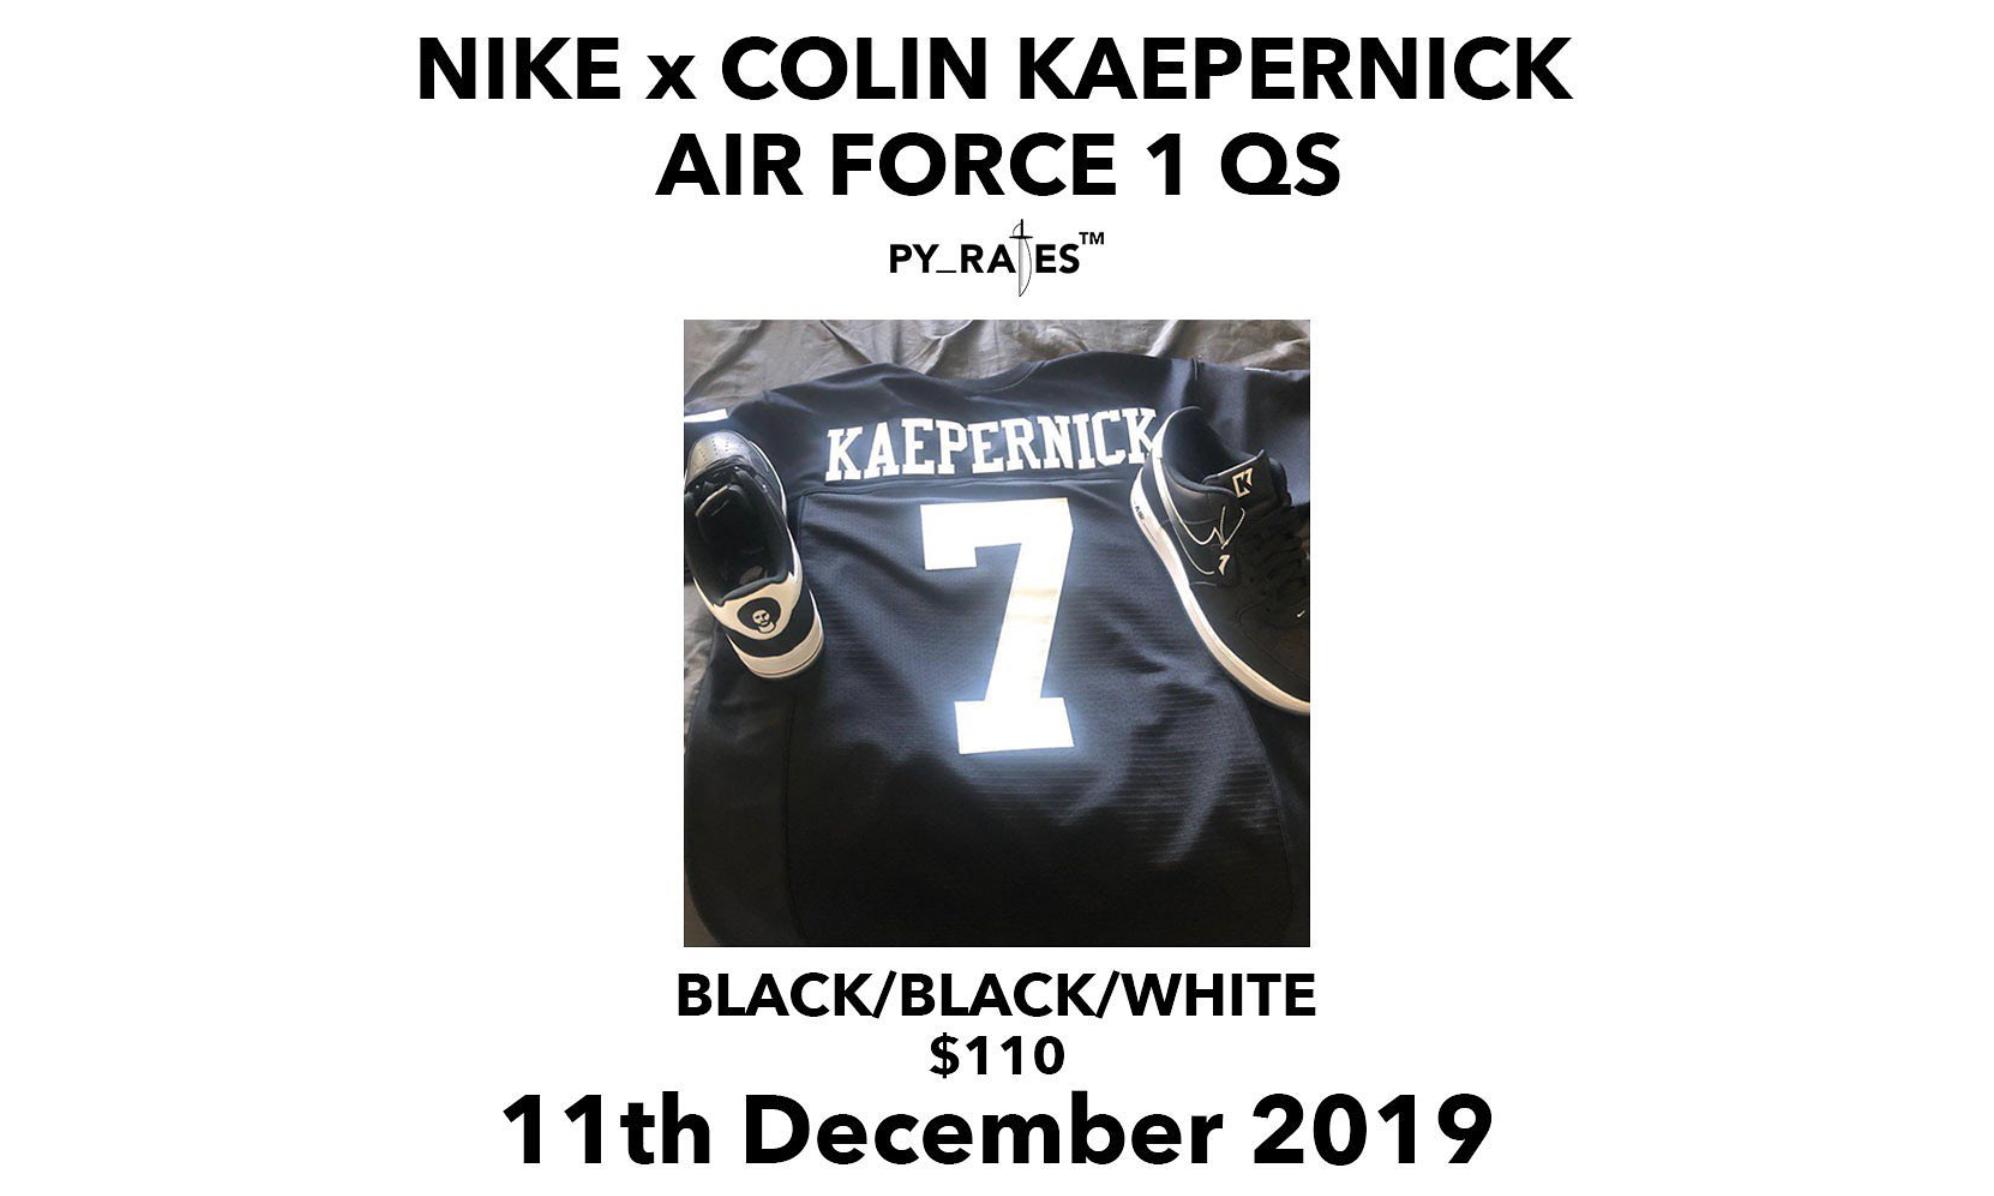 Nike 将与 Colin Kaepernick 推出联名 Air Force 1